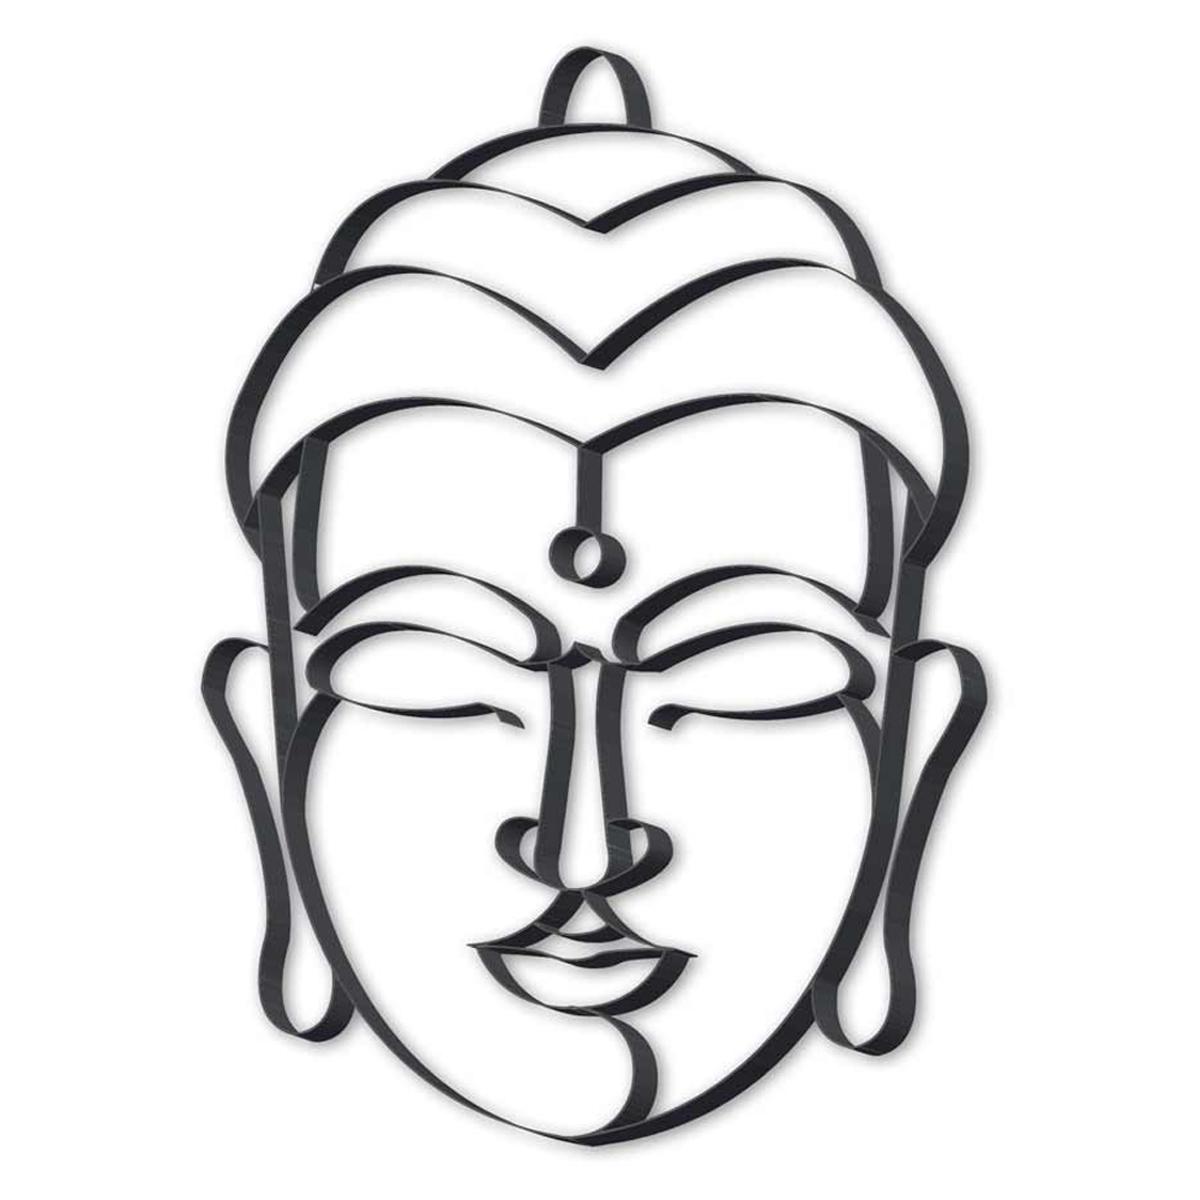 Décoration métal XXL \'Bouddha\' noir - 815x615x25 cm - [R2079]